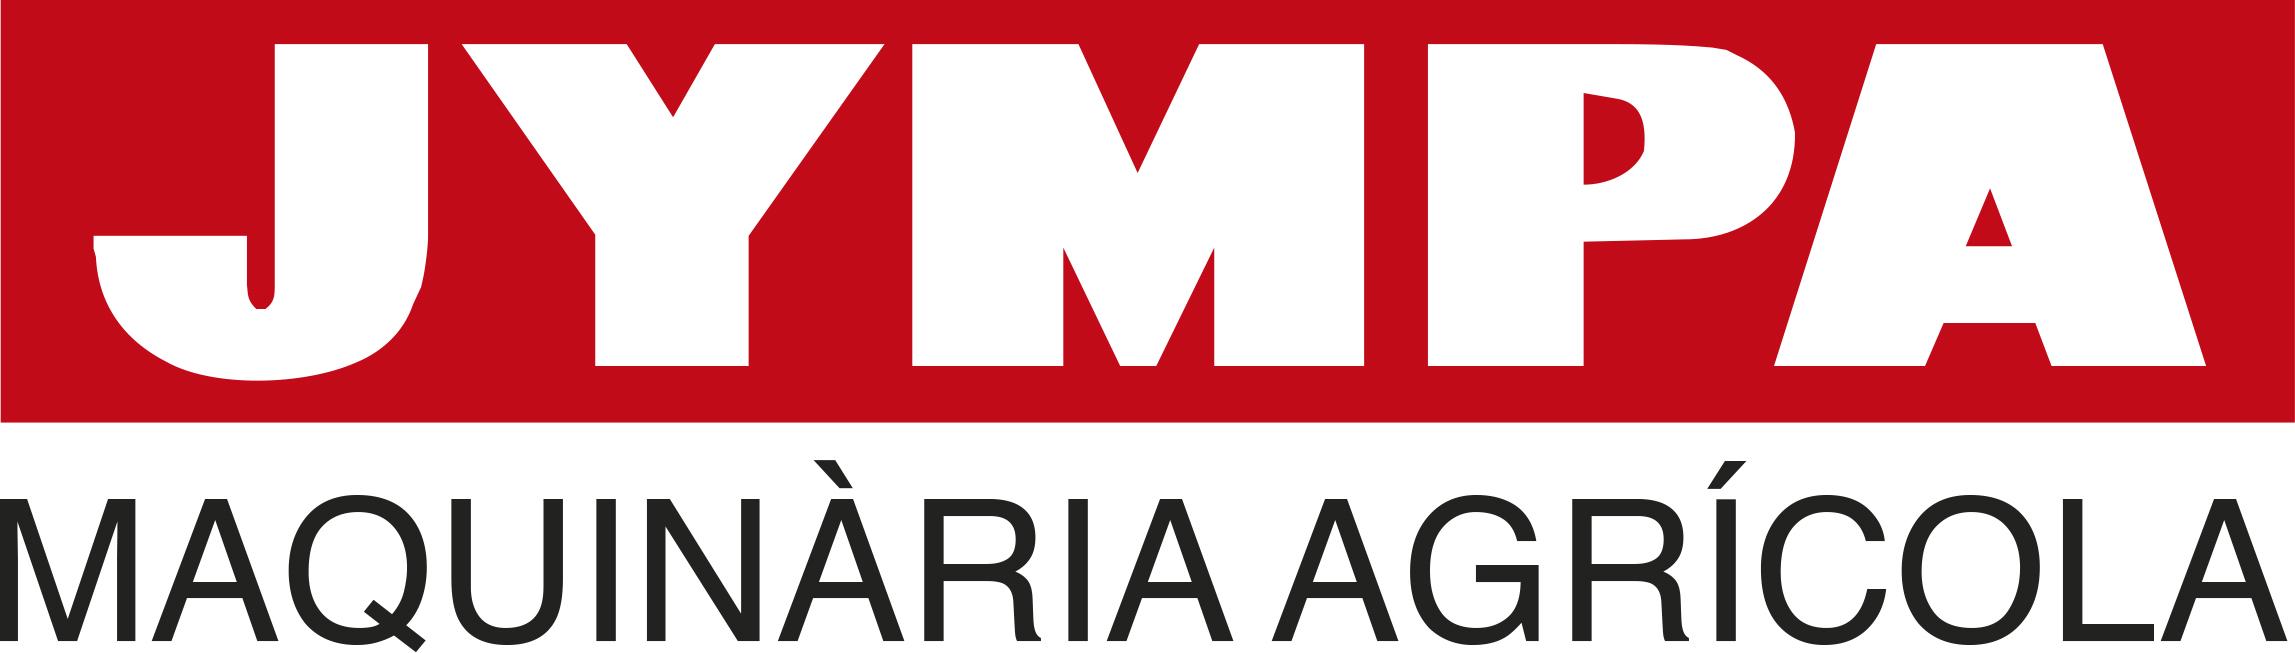 JYMPA, Maquinària Agrícola